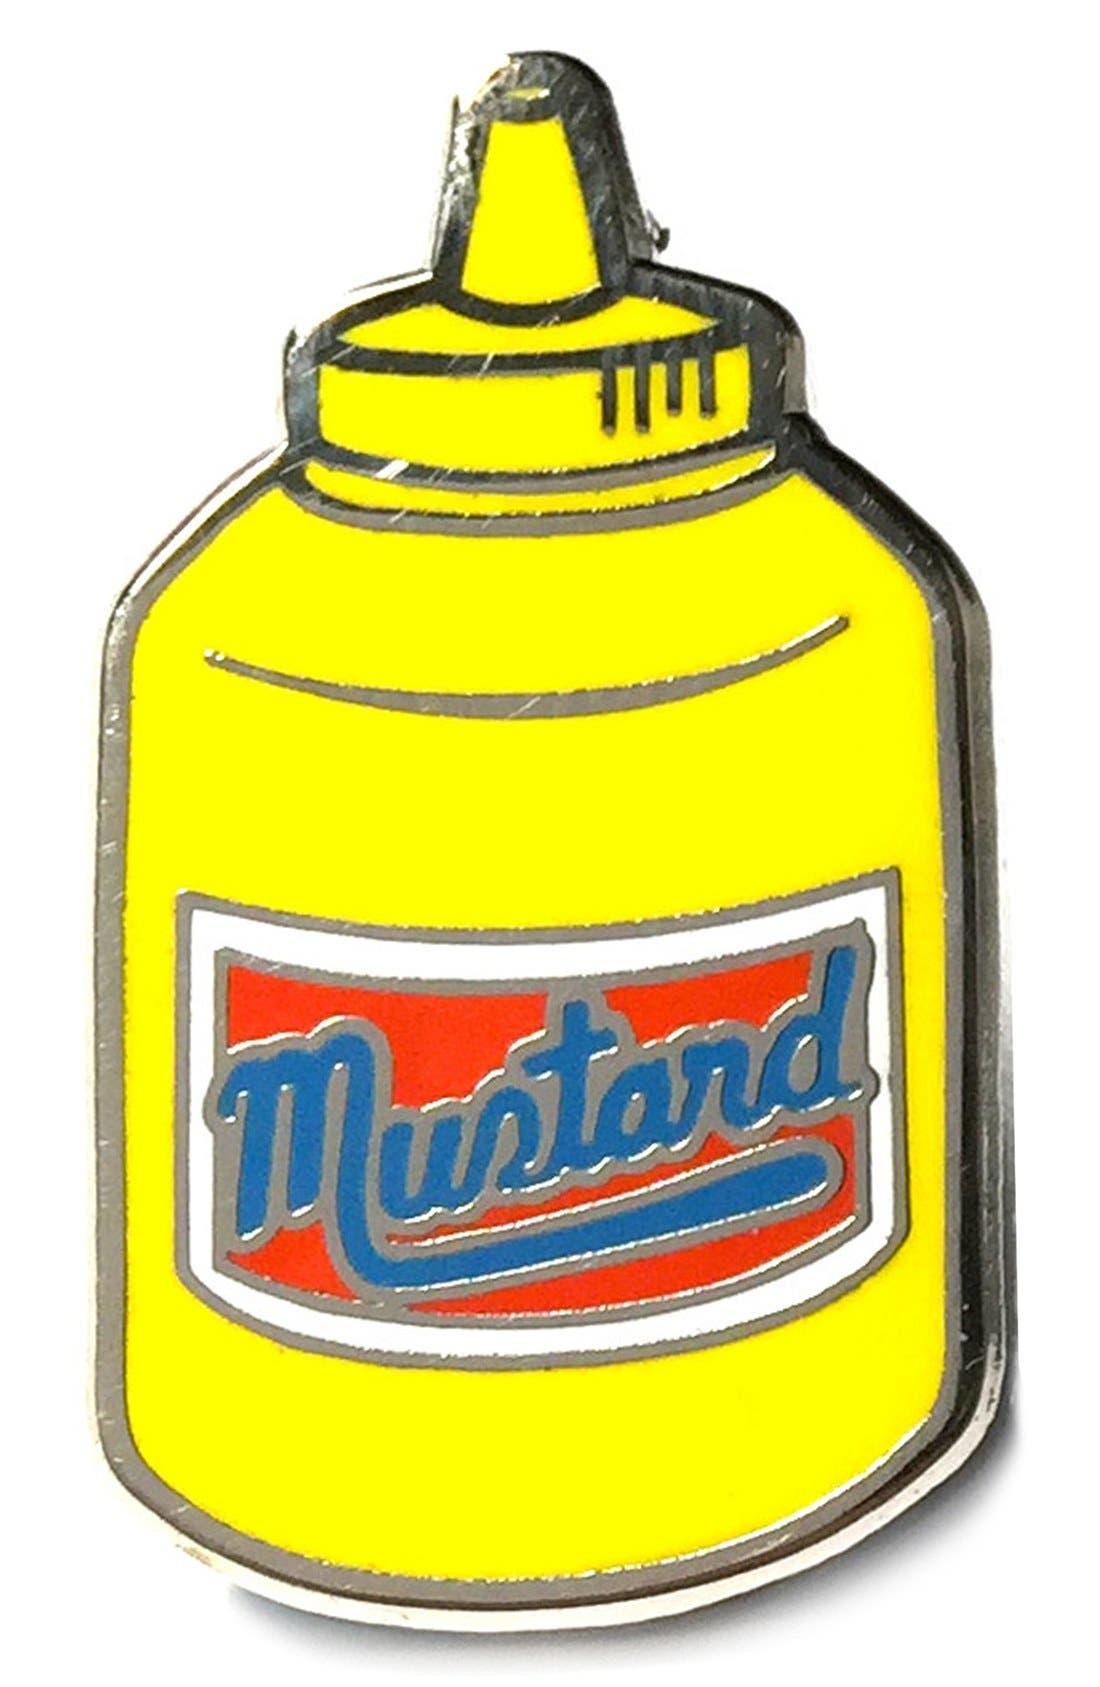 Alternate Image 1 Selected - PINTRILL 'Mustard' Fashion Accessory Pin